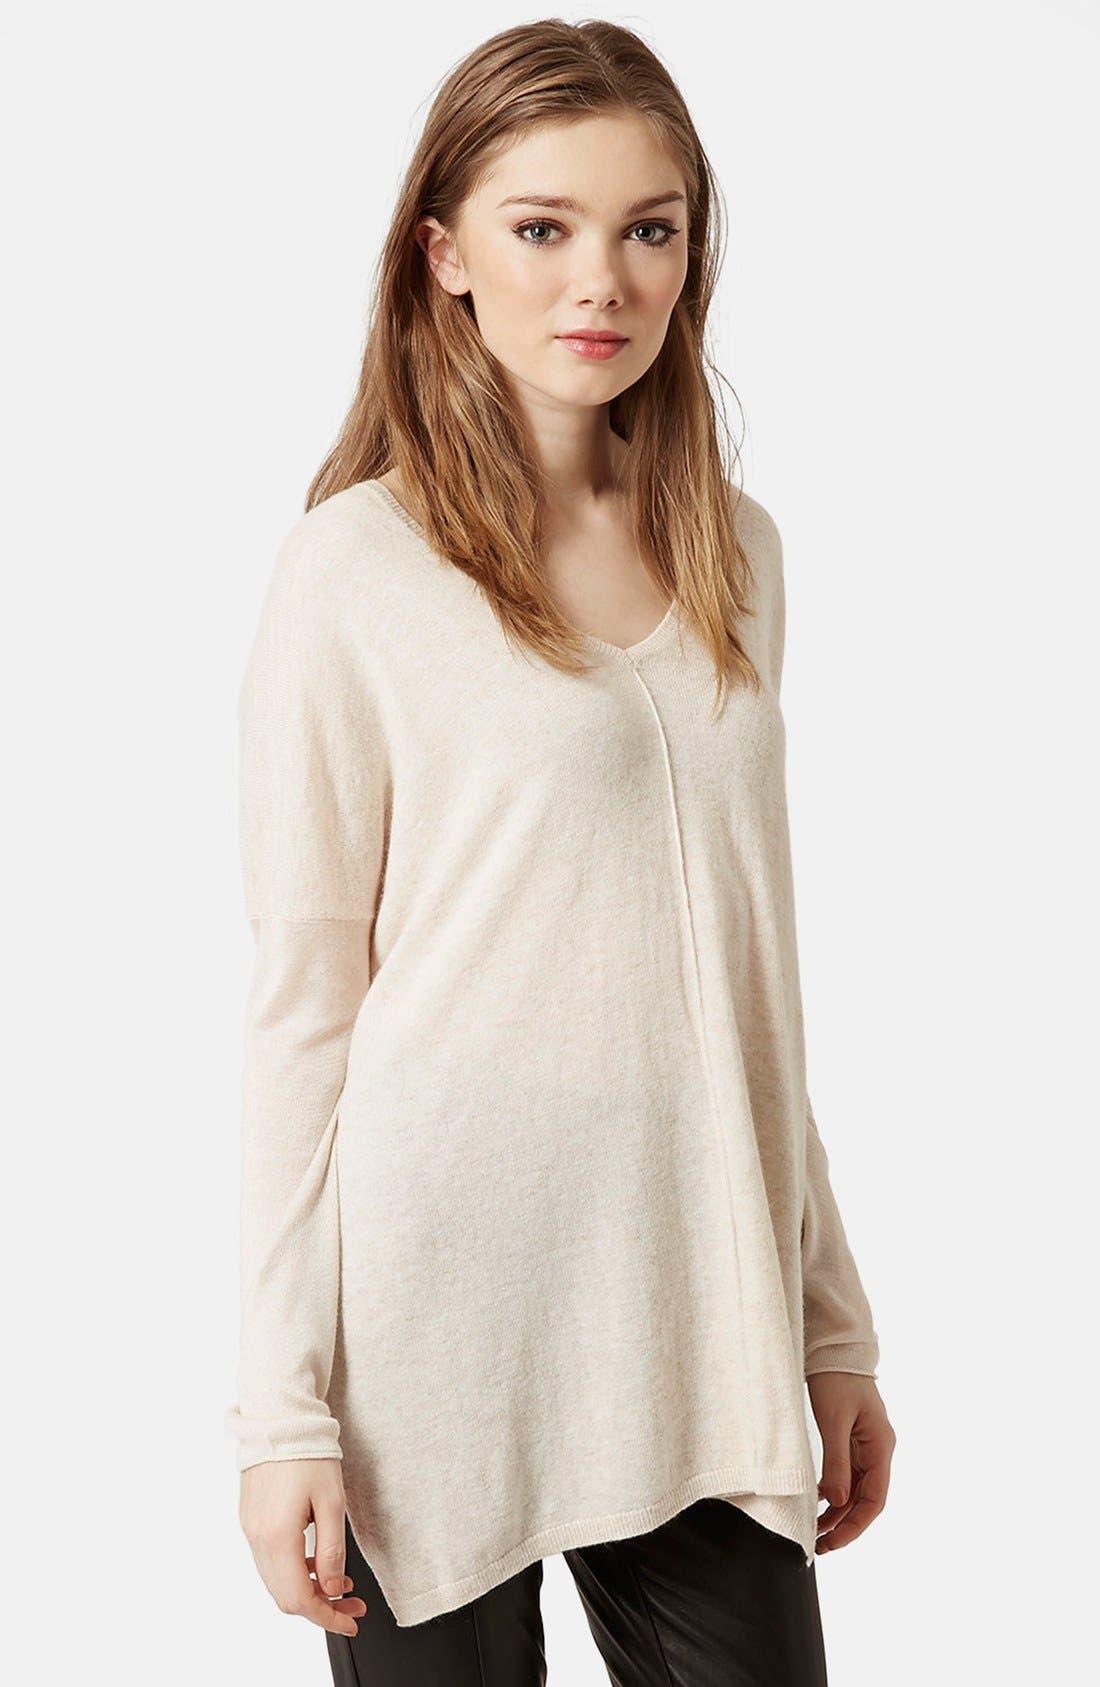 Alternate Image 1 Selected - Topshop Front Seam V-Neck Sweater